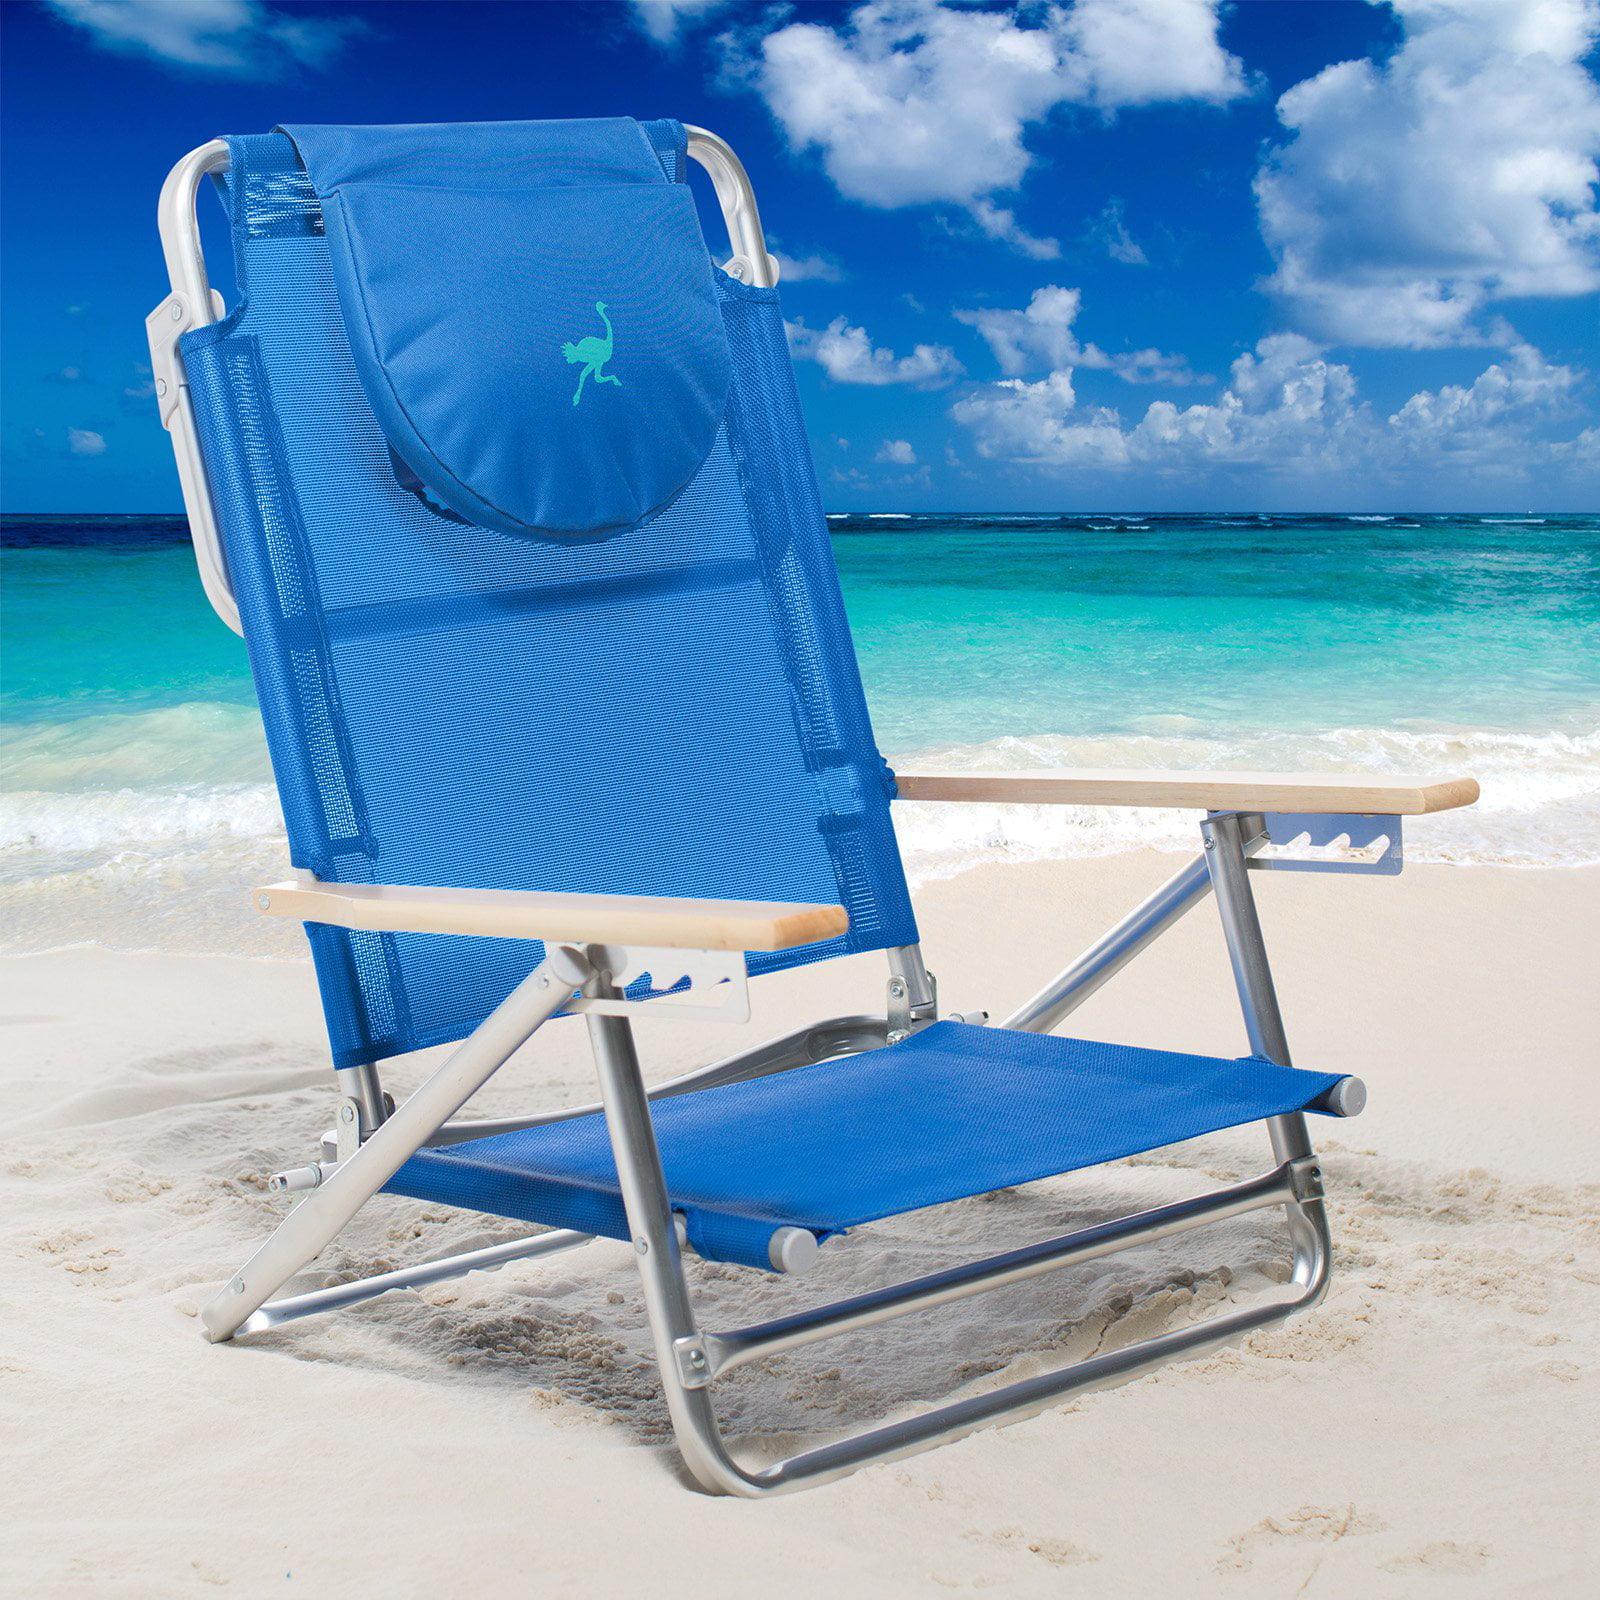 Ostrich South Beach 5-Position Sand Chair